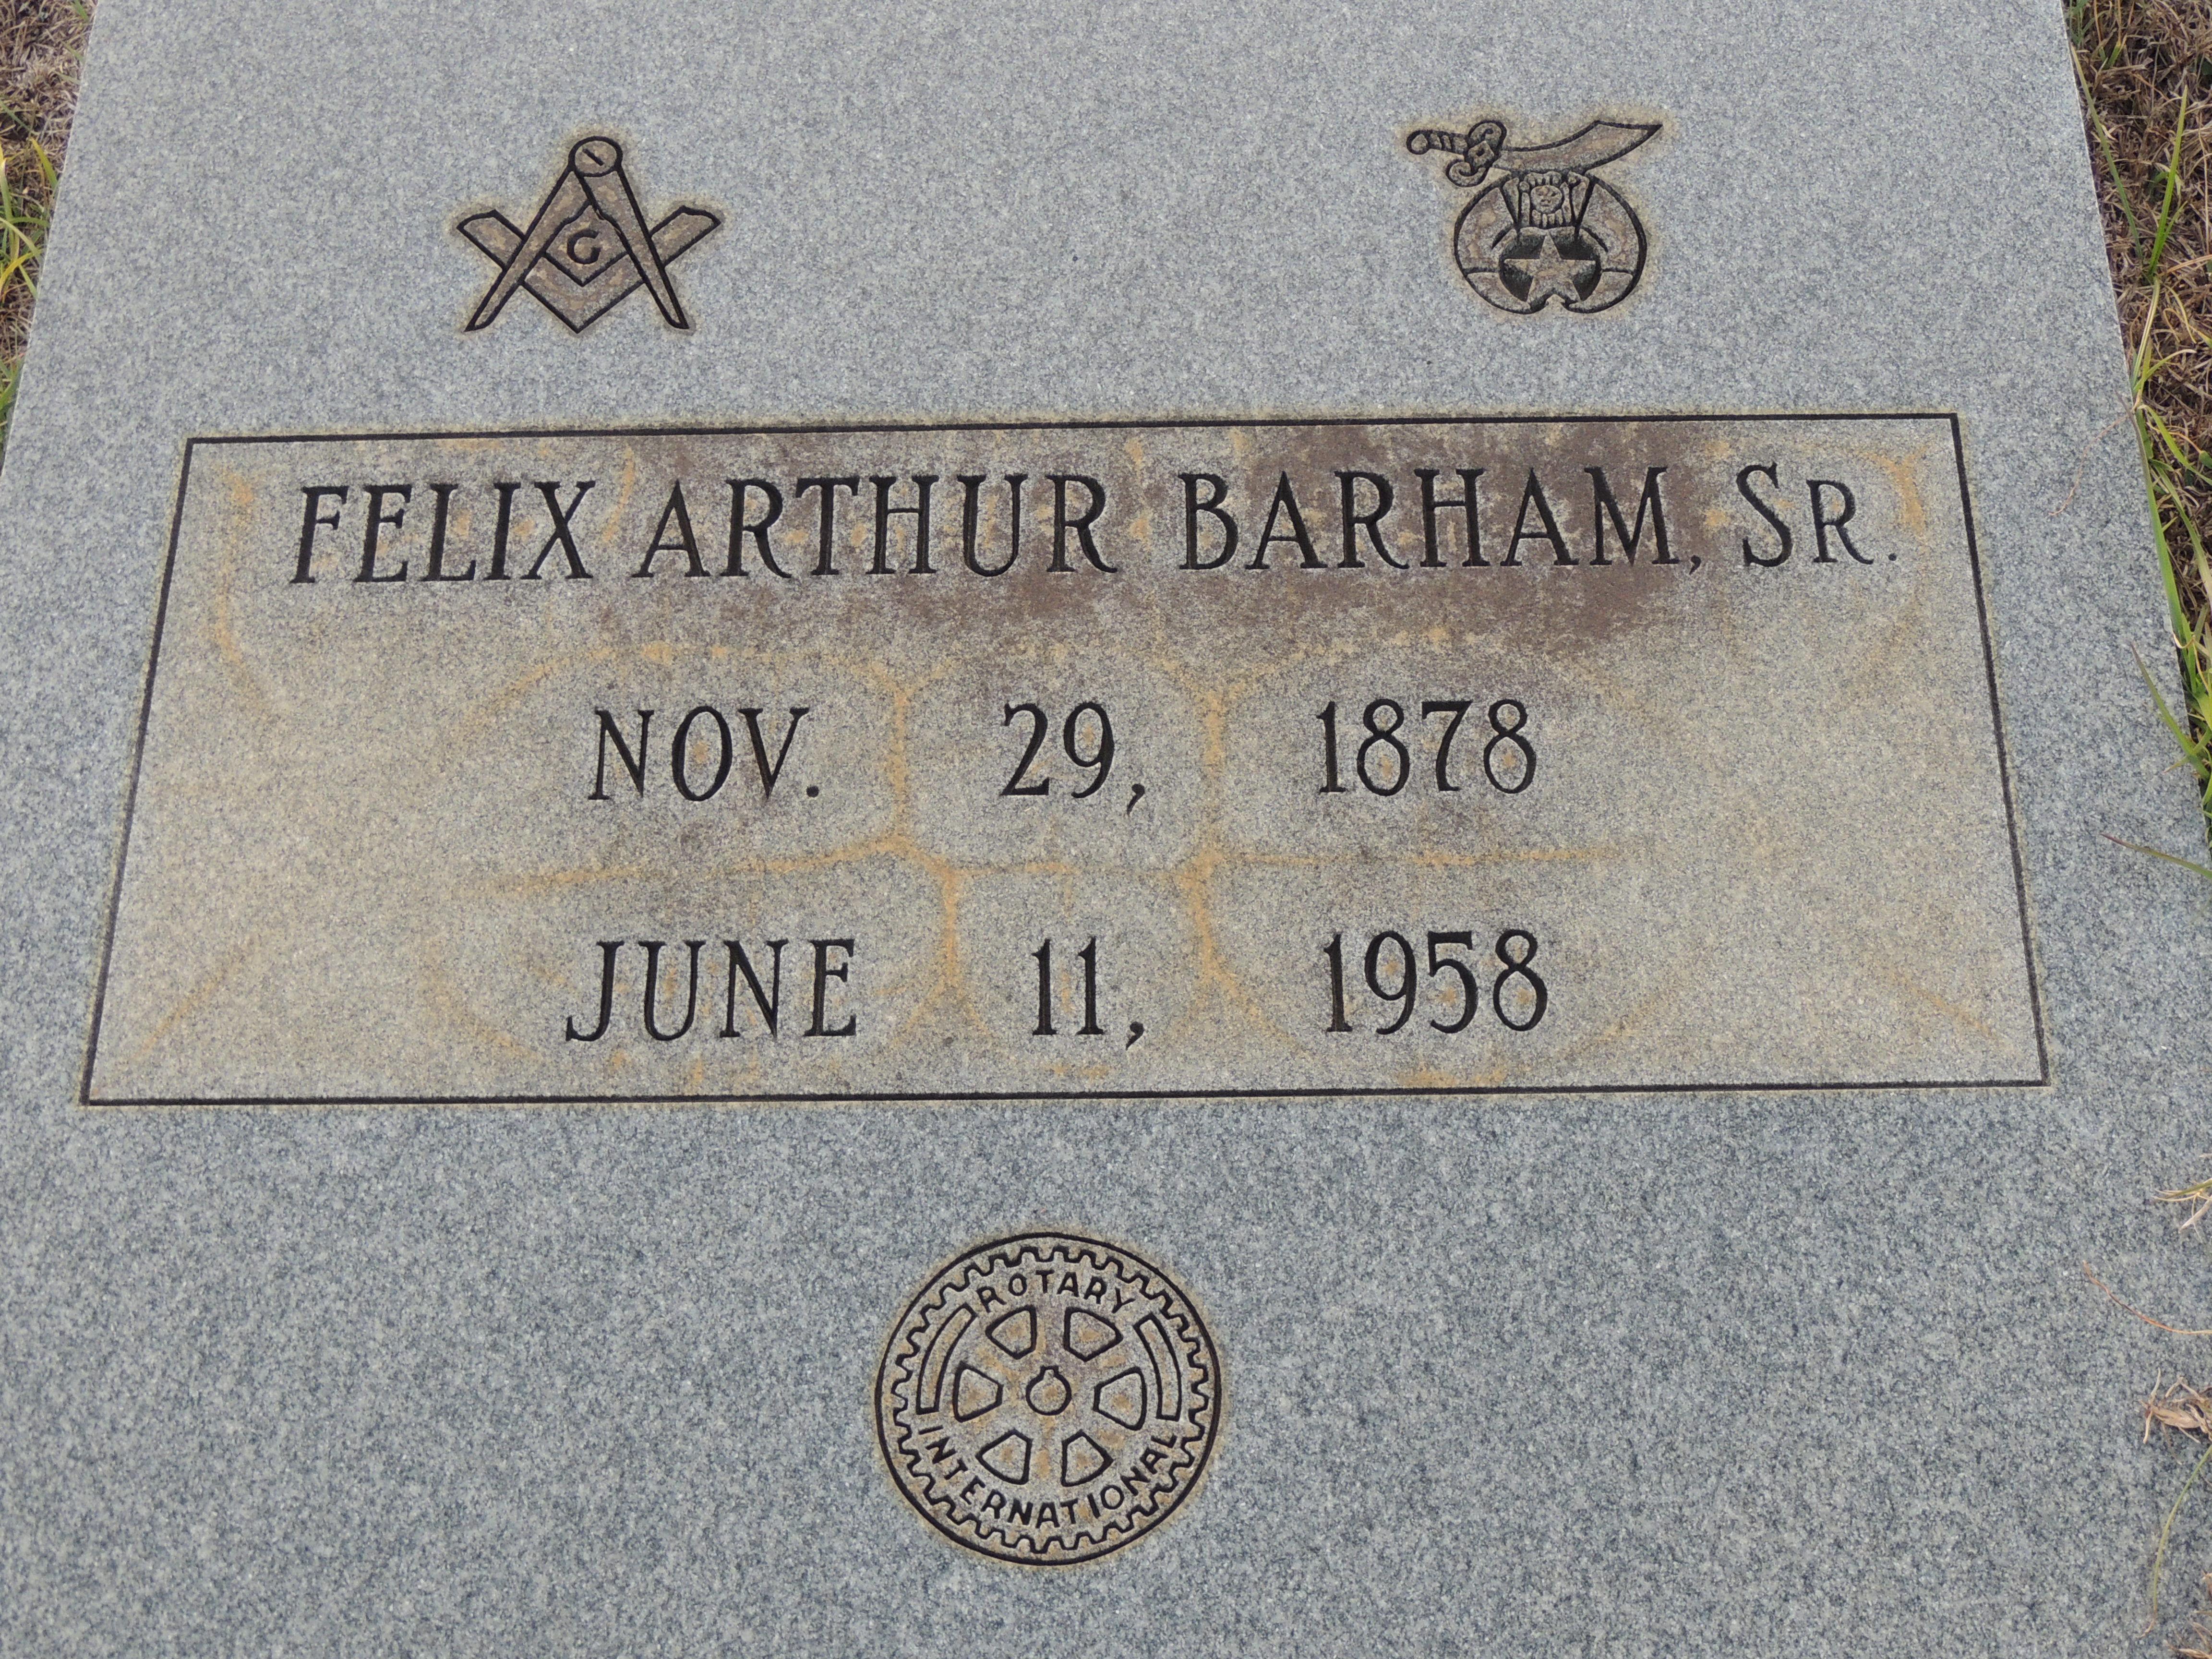 Felix Arthur Barham, Sr